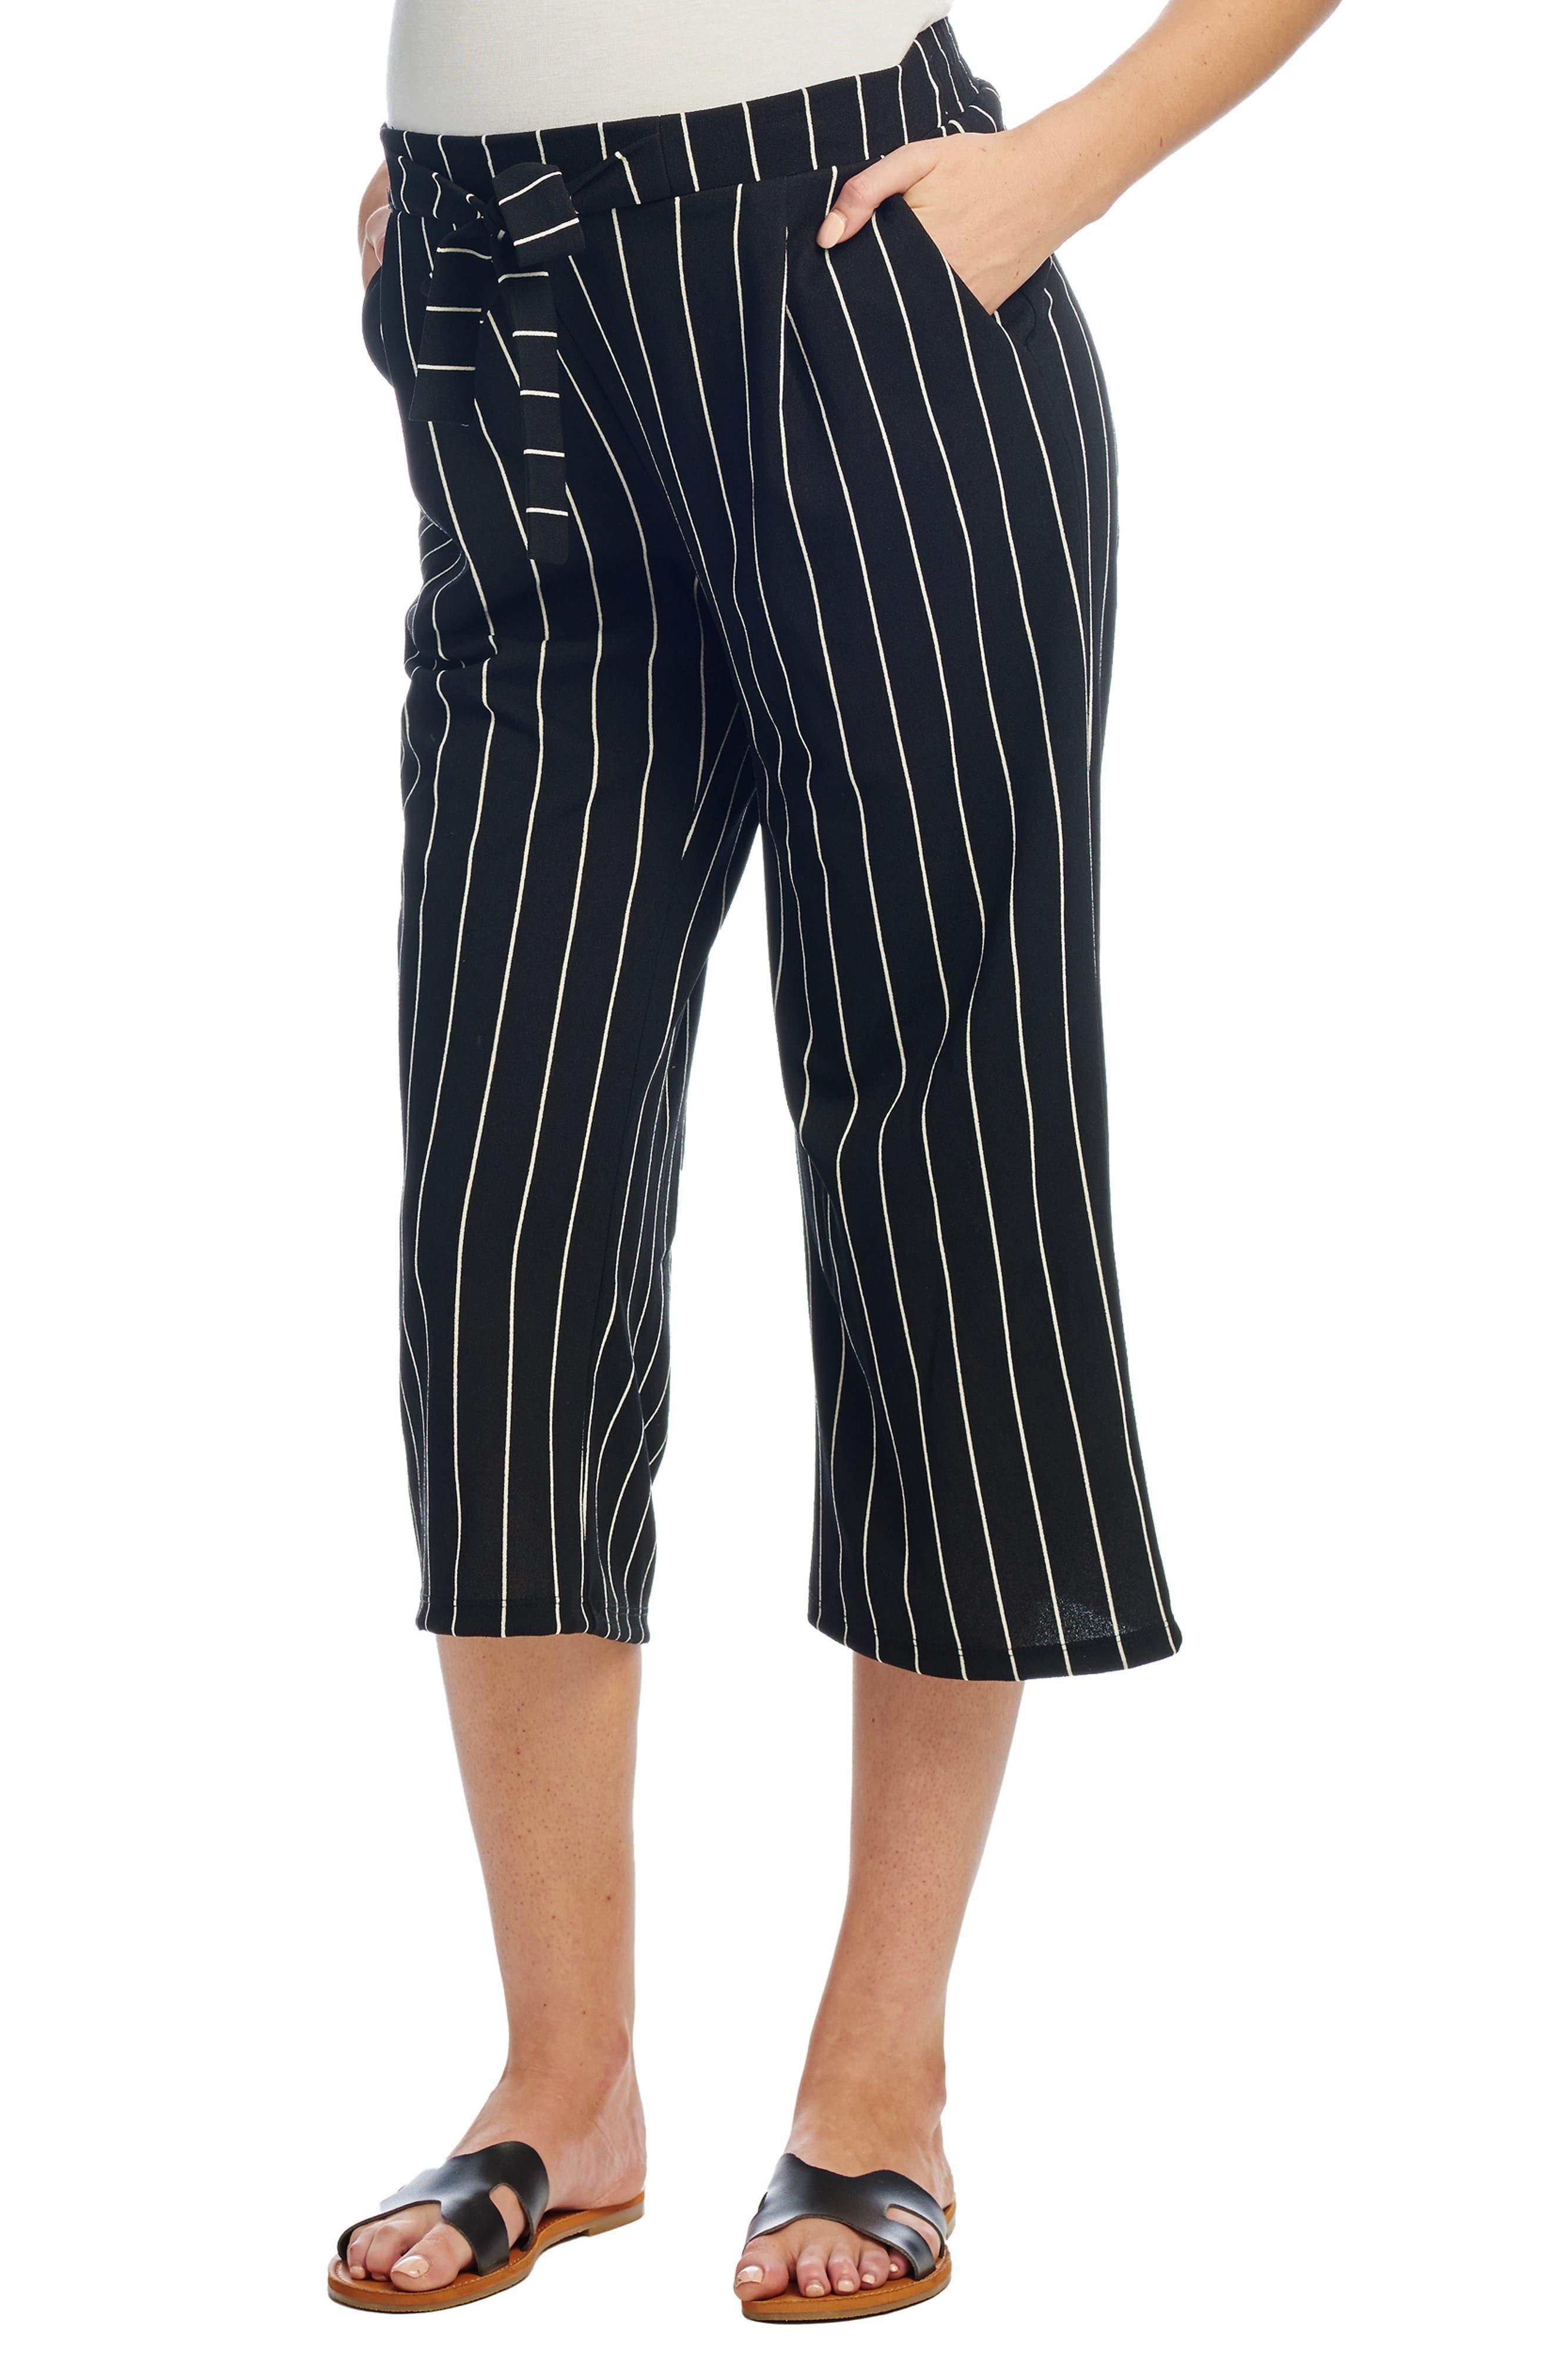 Everly Grey Makana Maternity Crop Pants | Nordstrom